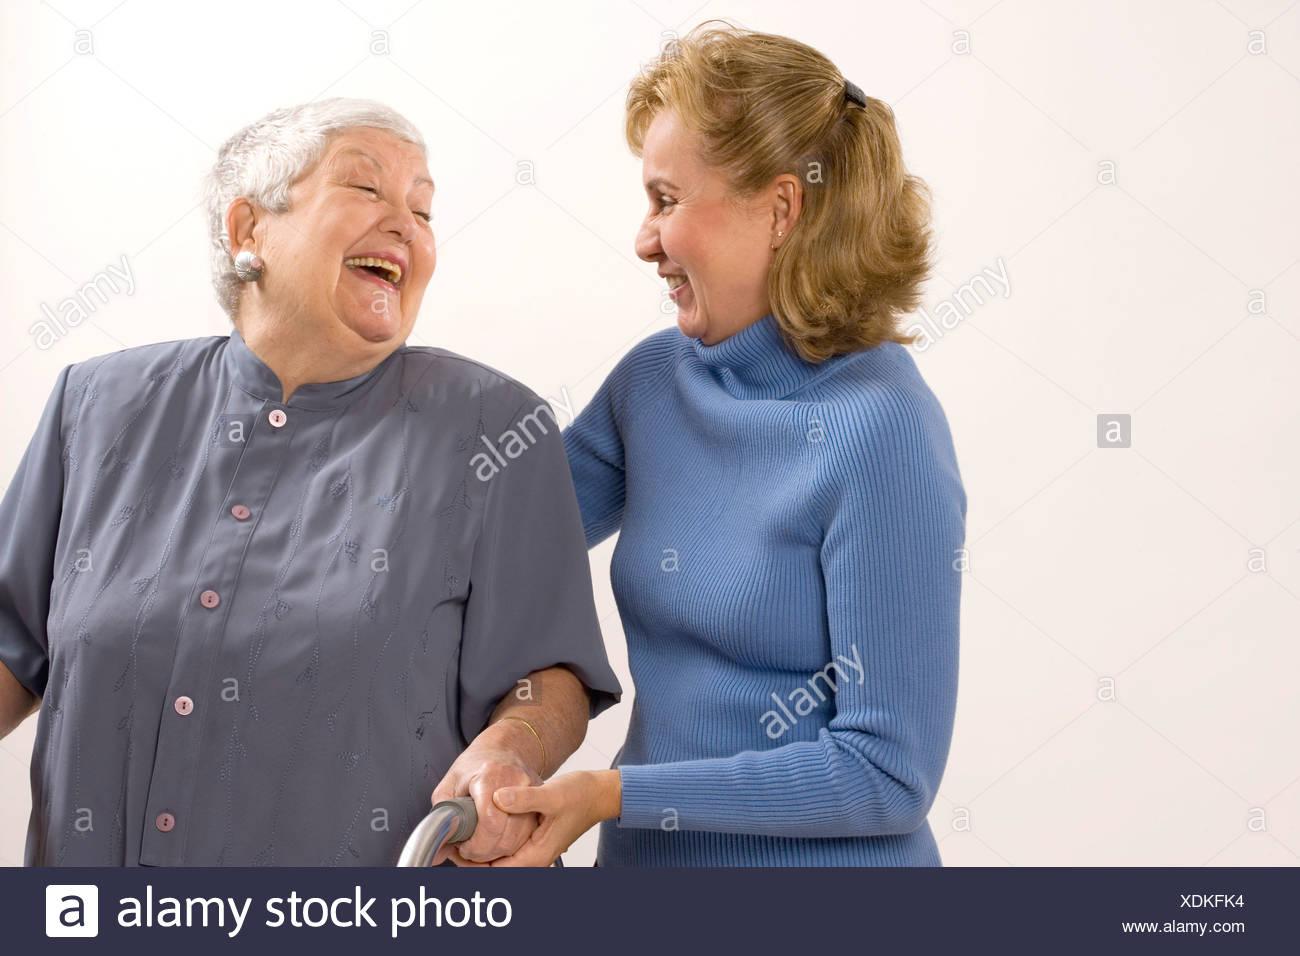 Delirium, opinion Senior adult friend remarkable, useful